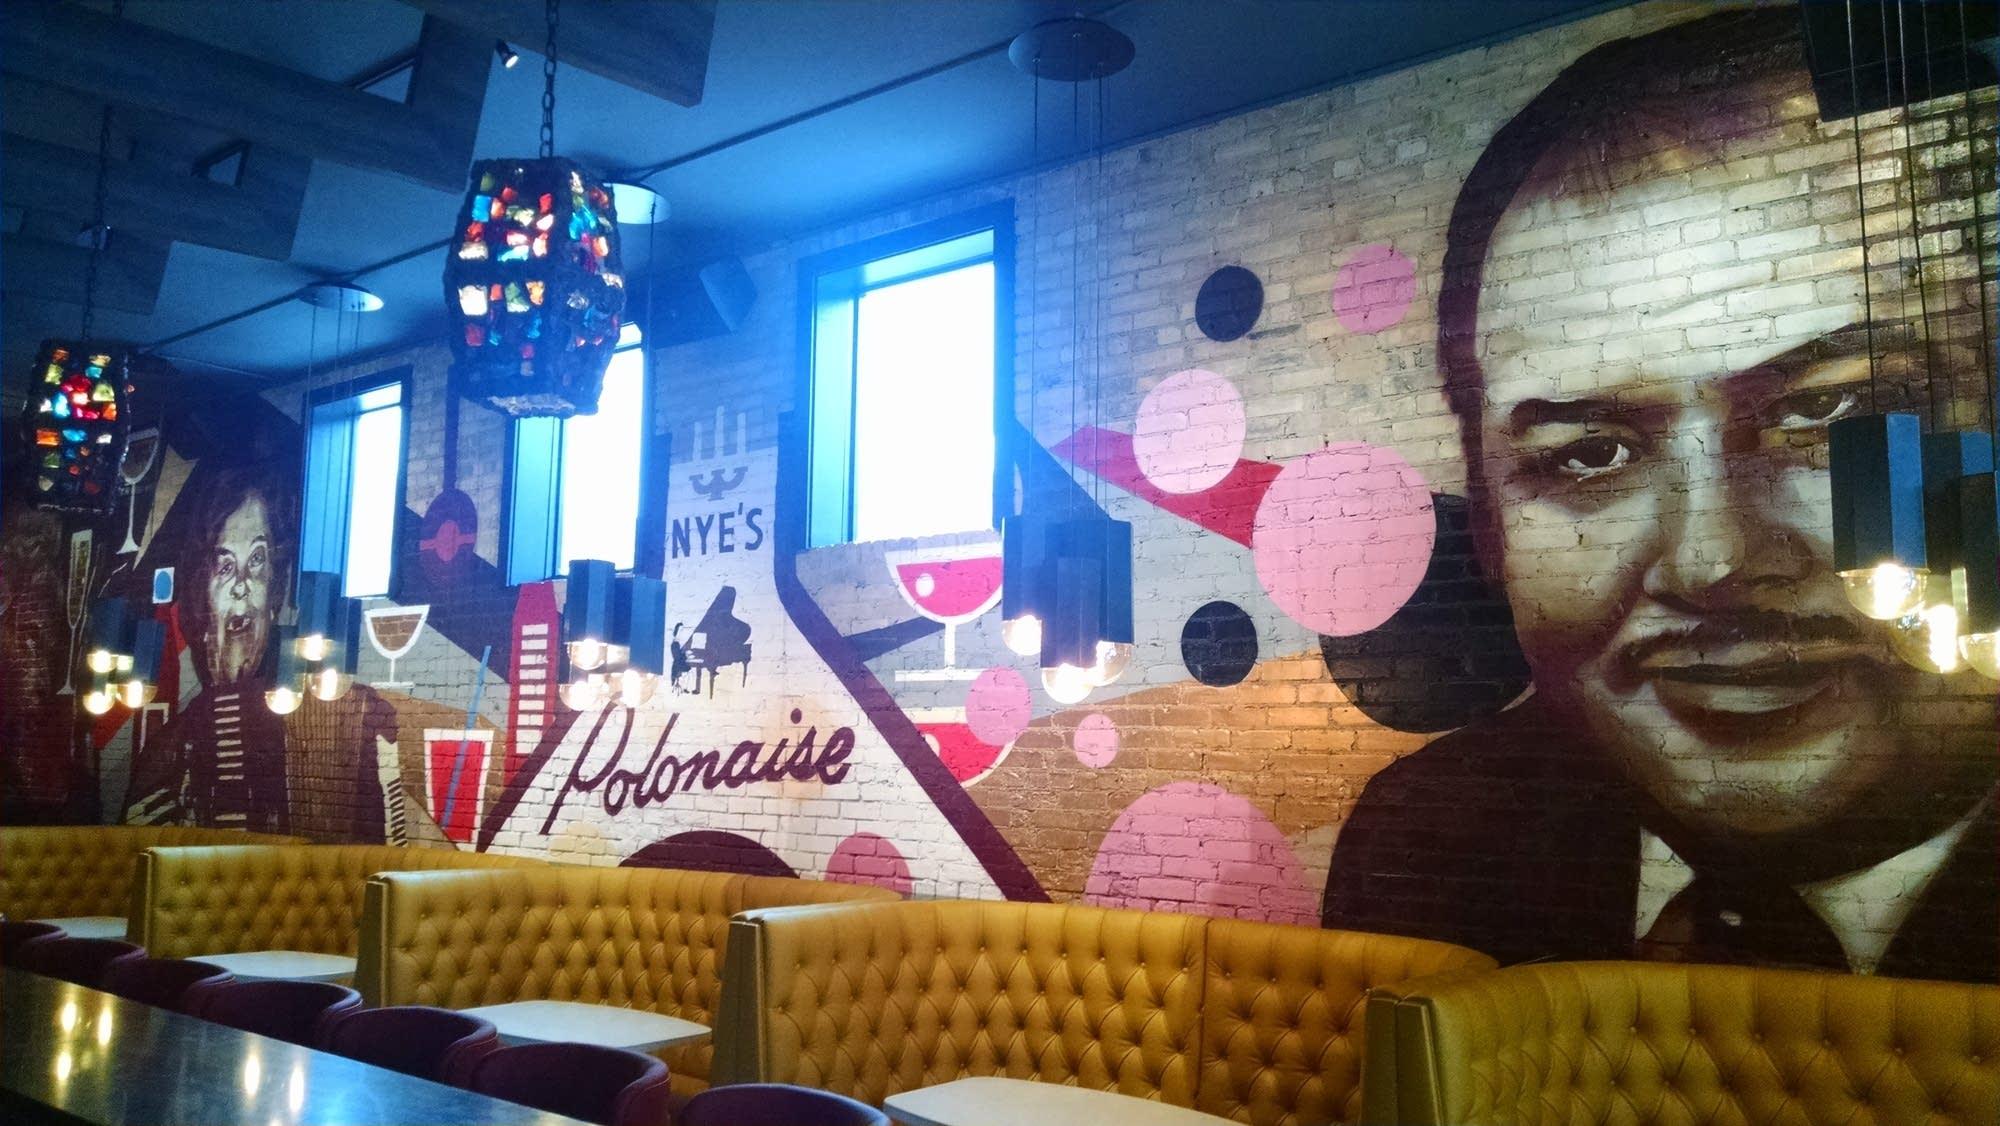 New Nye's bar hopes to recapture old magic | Minnesota ...